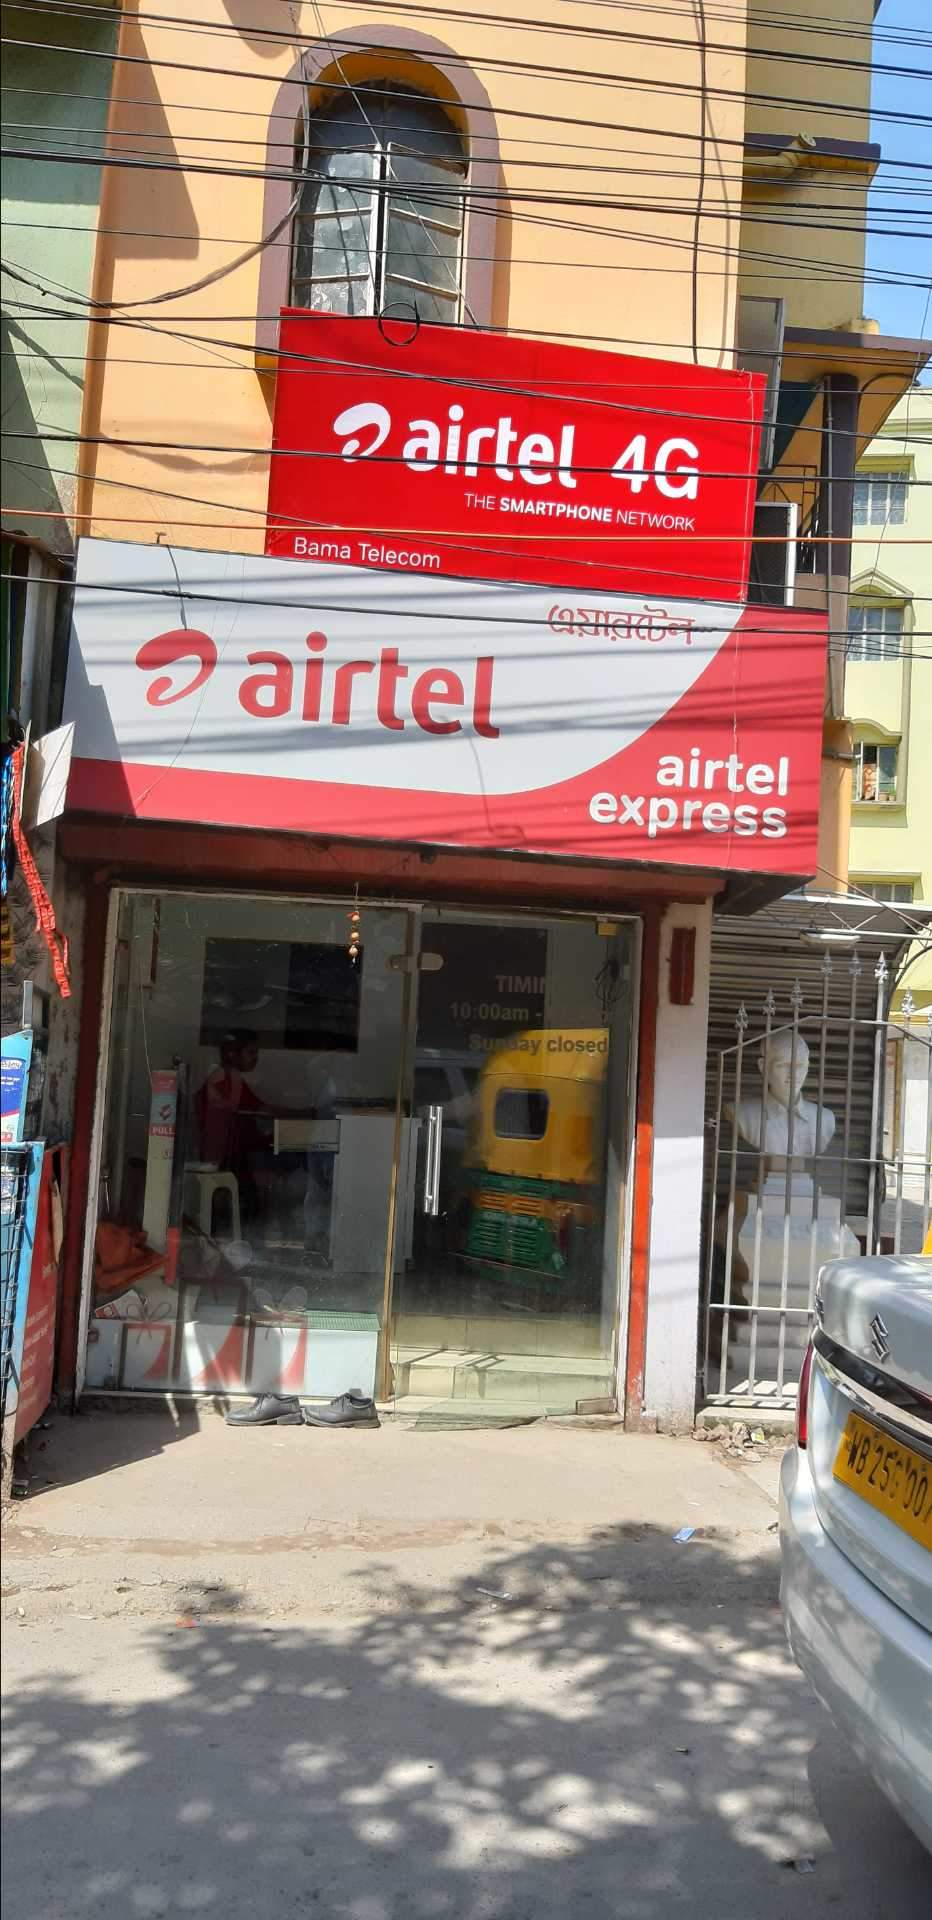 Top Airtel Mobile Phone Bill Payment Centres in Dum Dum